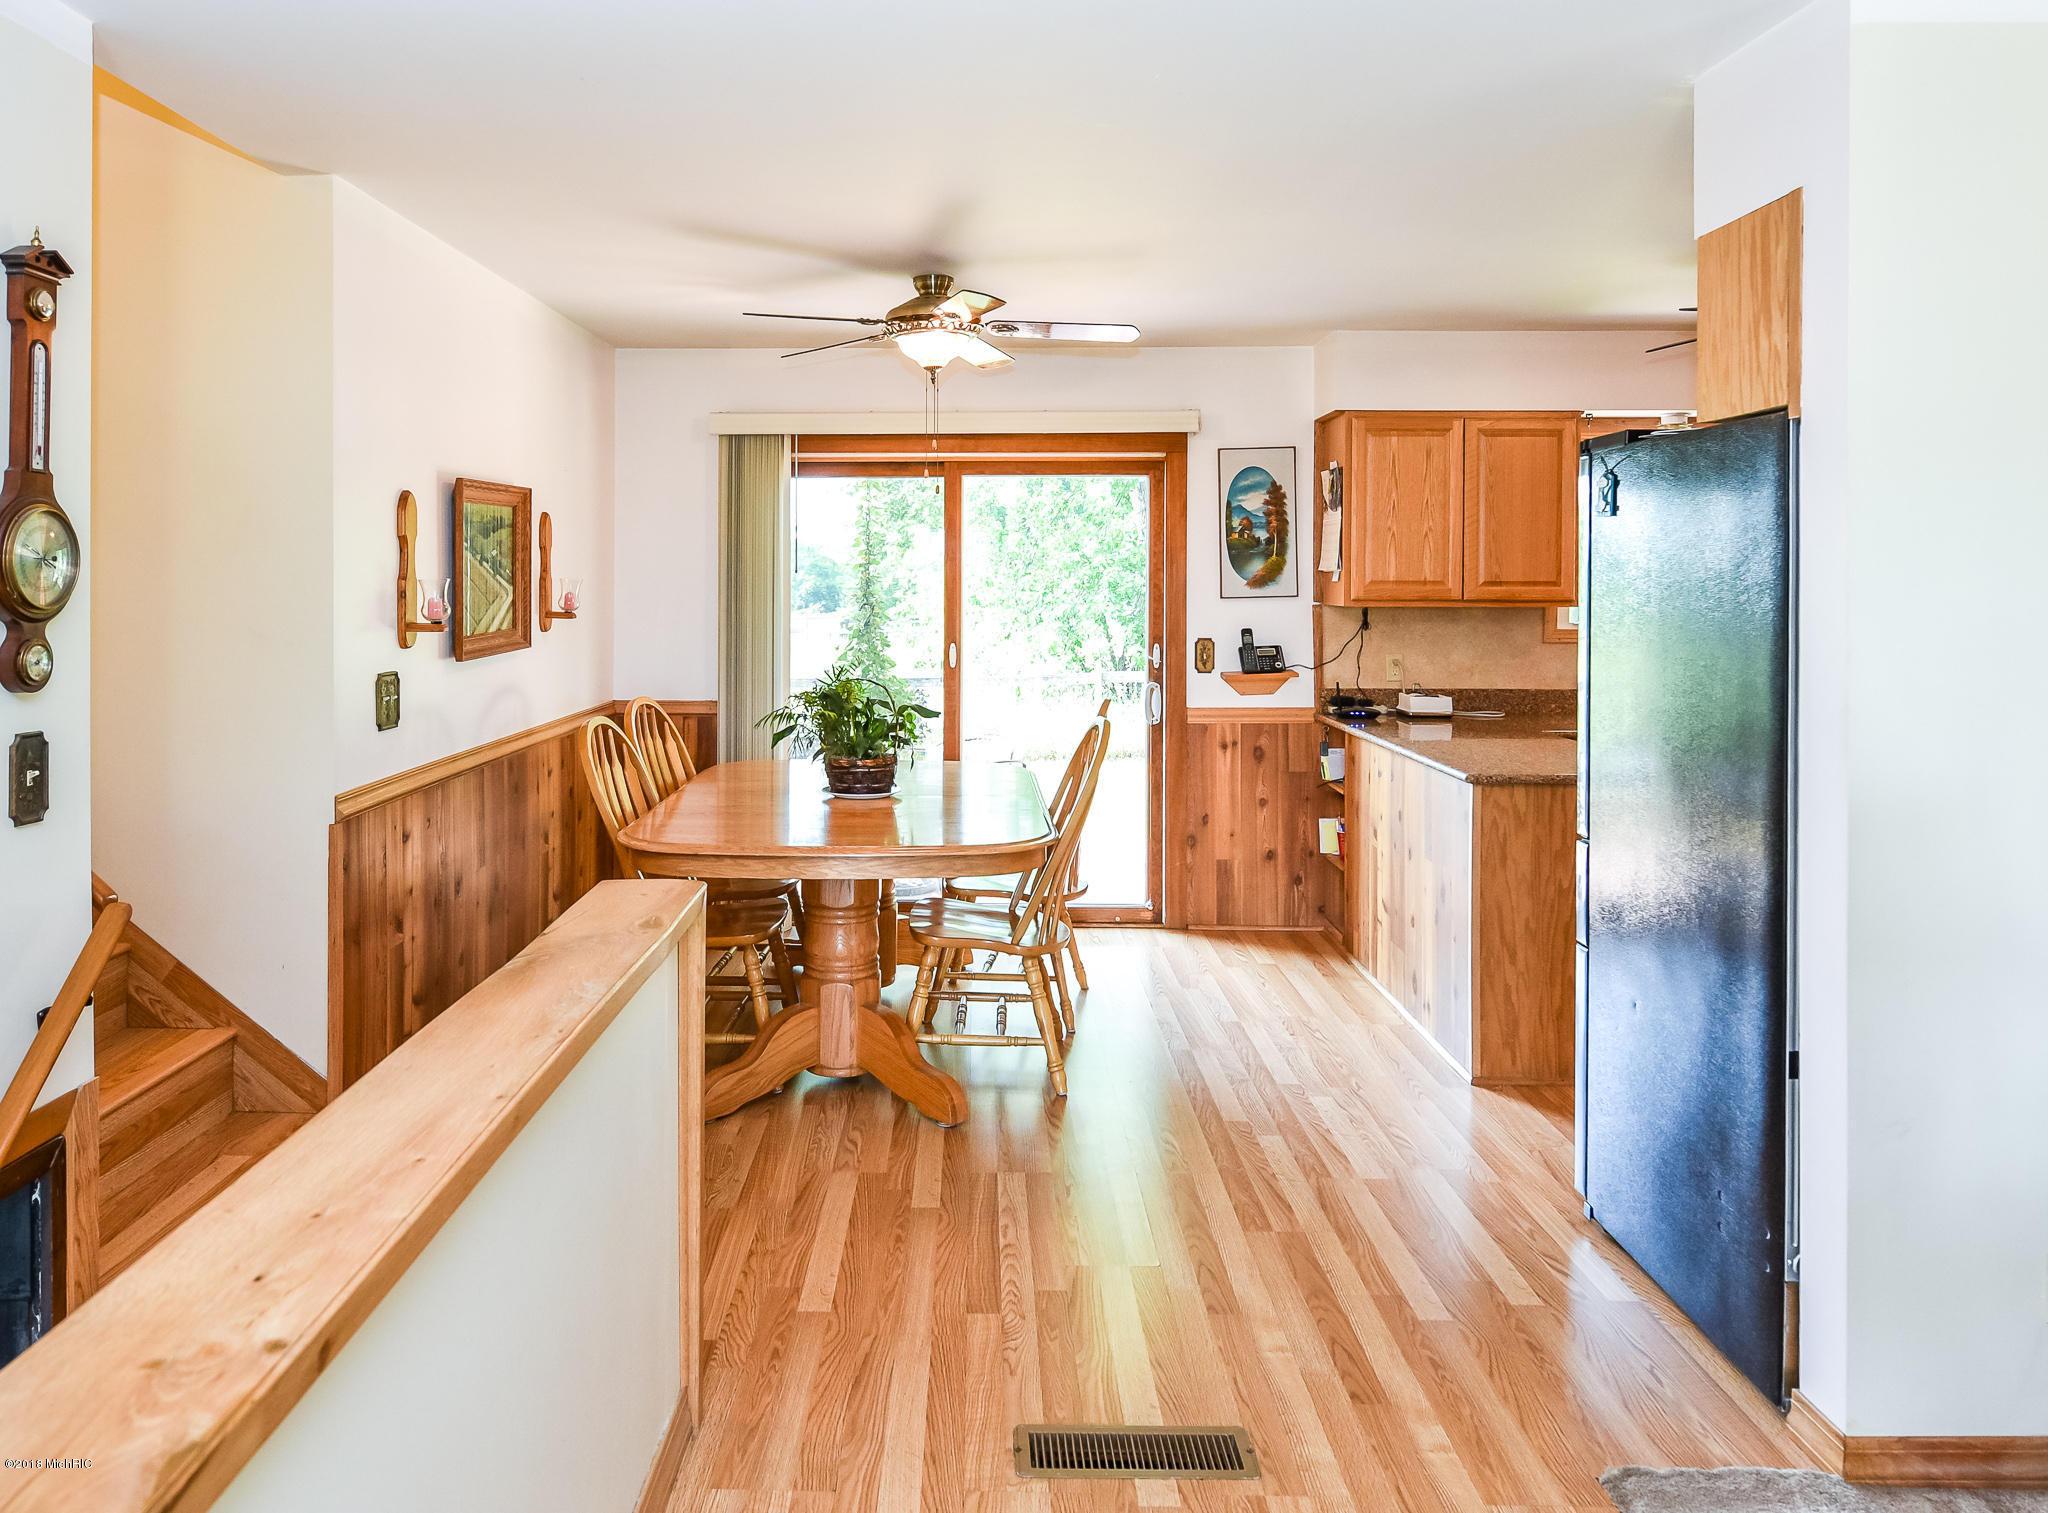 hardwood floor refinishing michigan of 10420 92nd street se alto 49302 mls 18033508 greenridge for 10420 92nd street se alto mi 49302